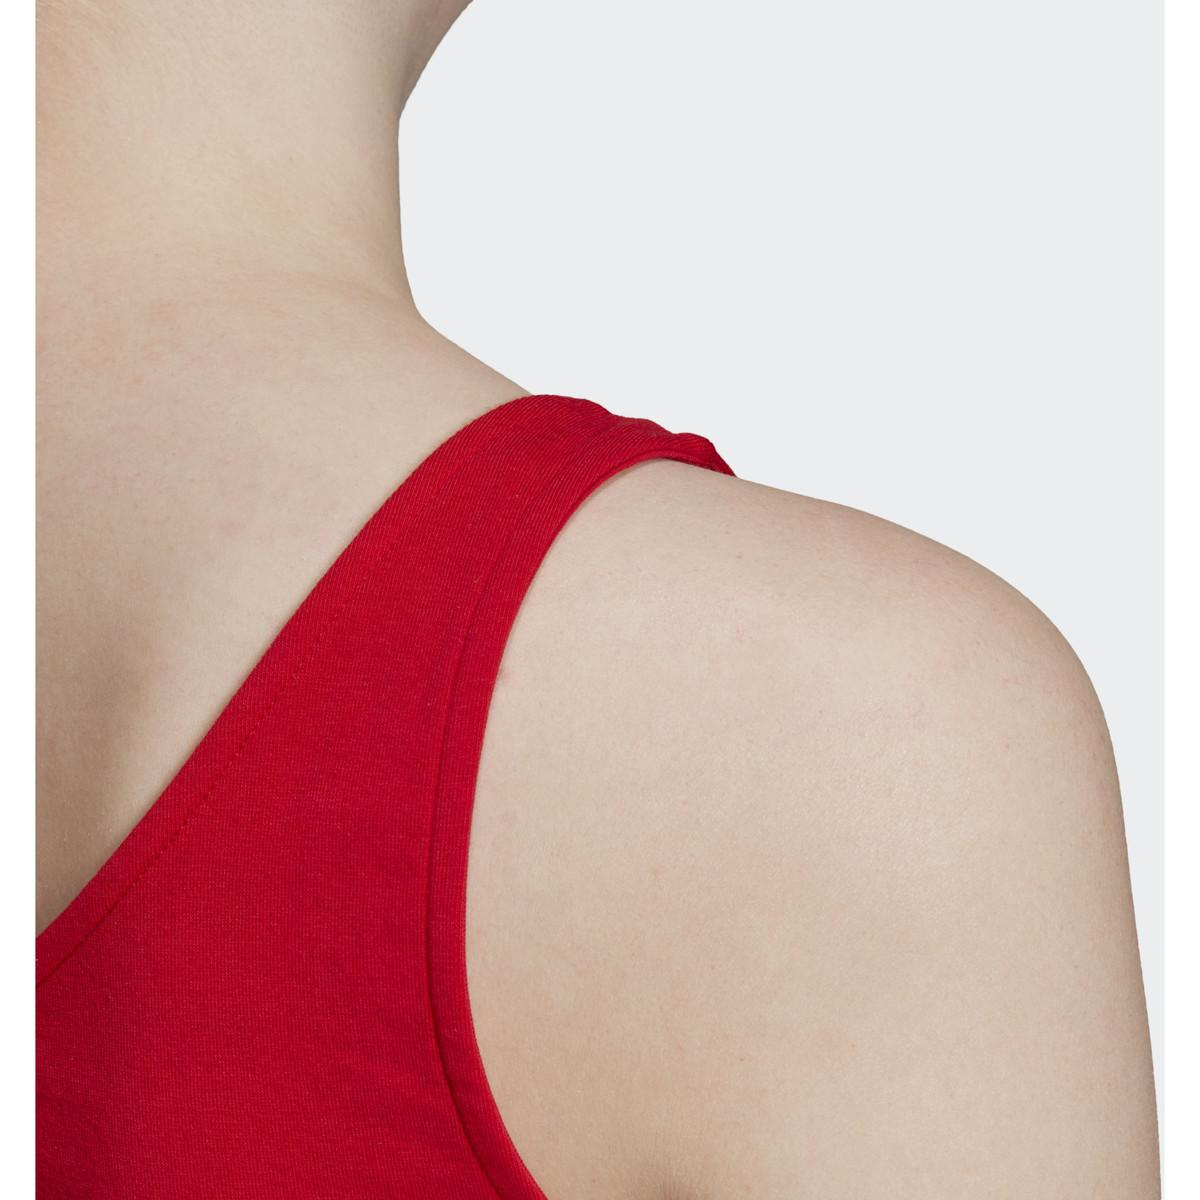 Crop top Brassières de sport adidas en coloris Rouge